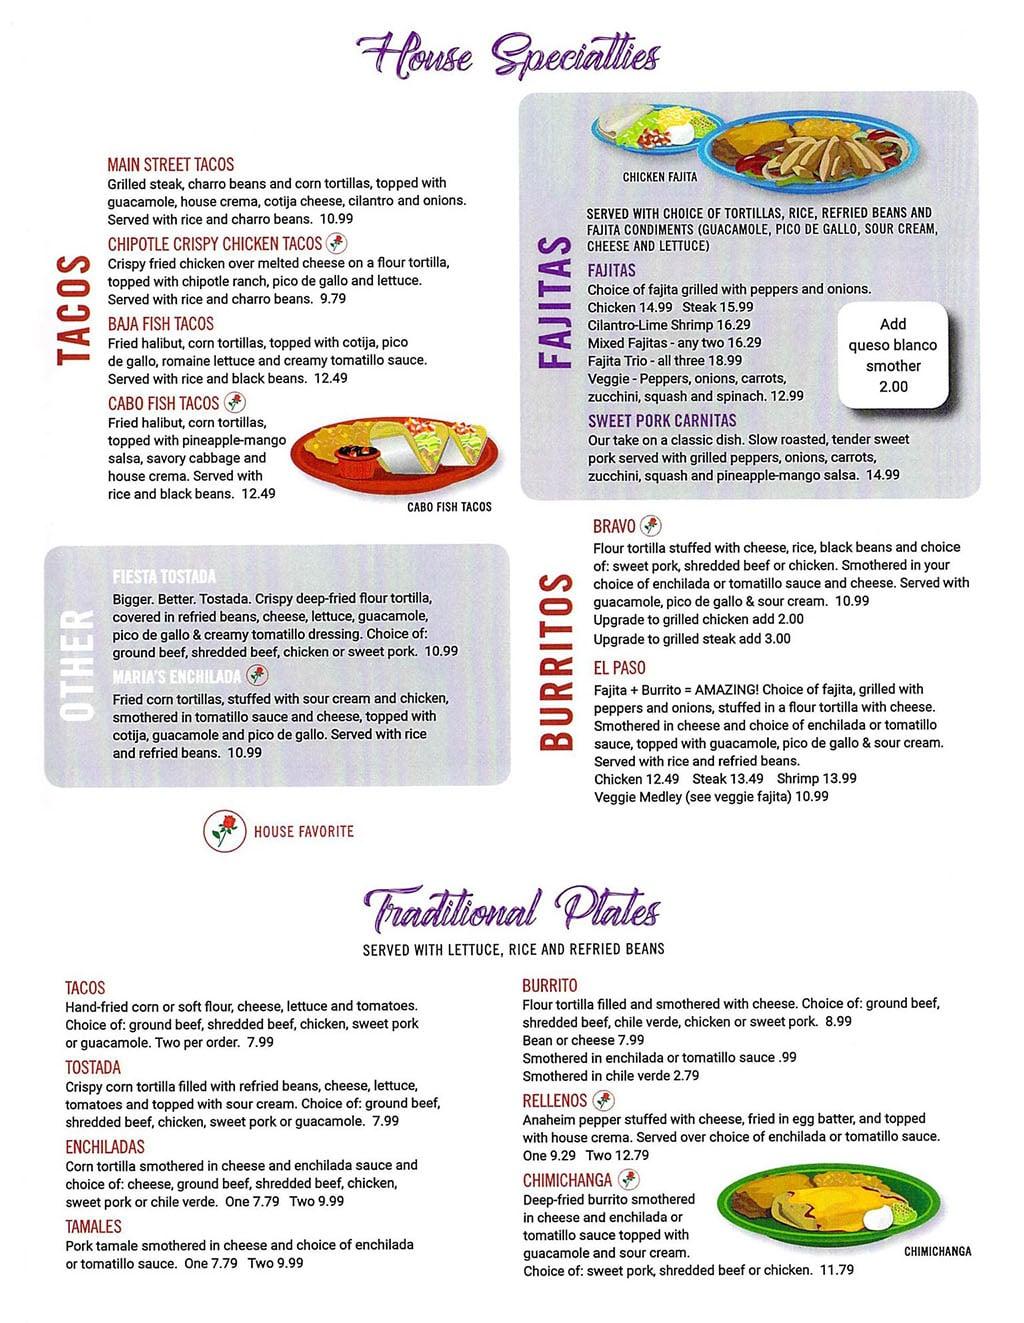 El Matador menu - house specialties, traditional plates